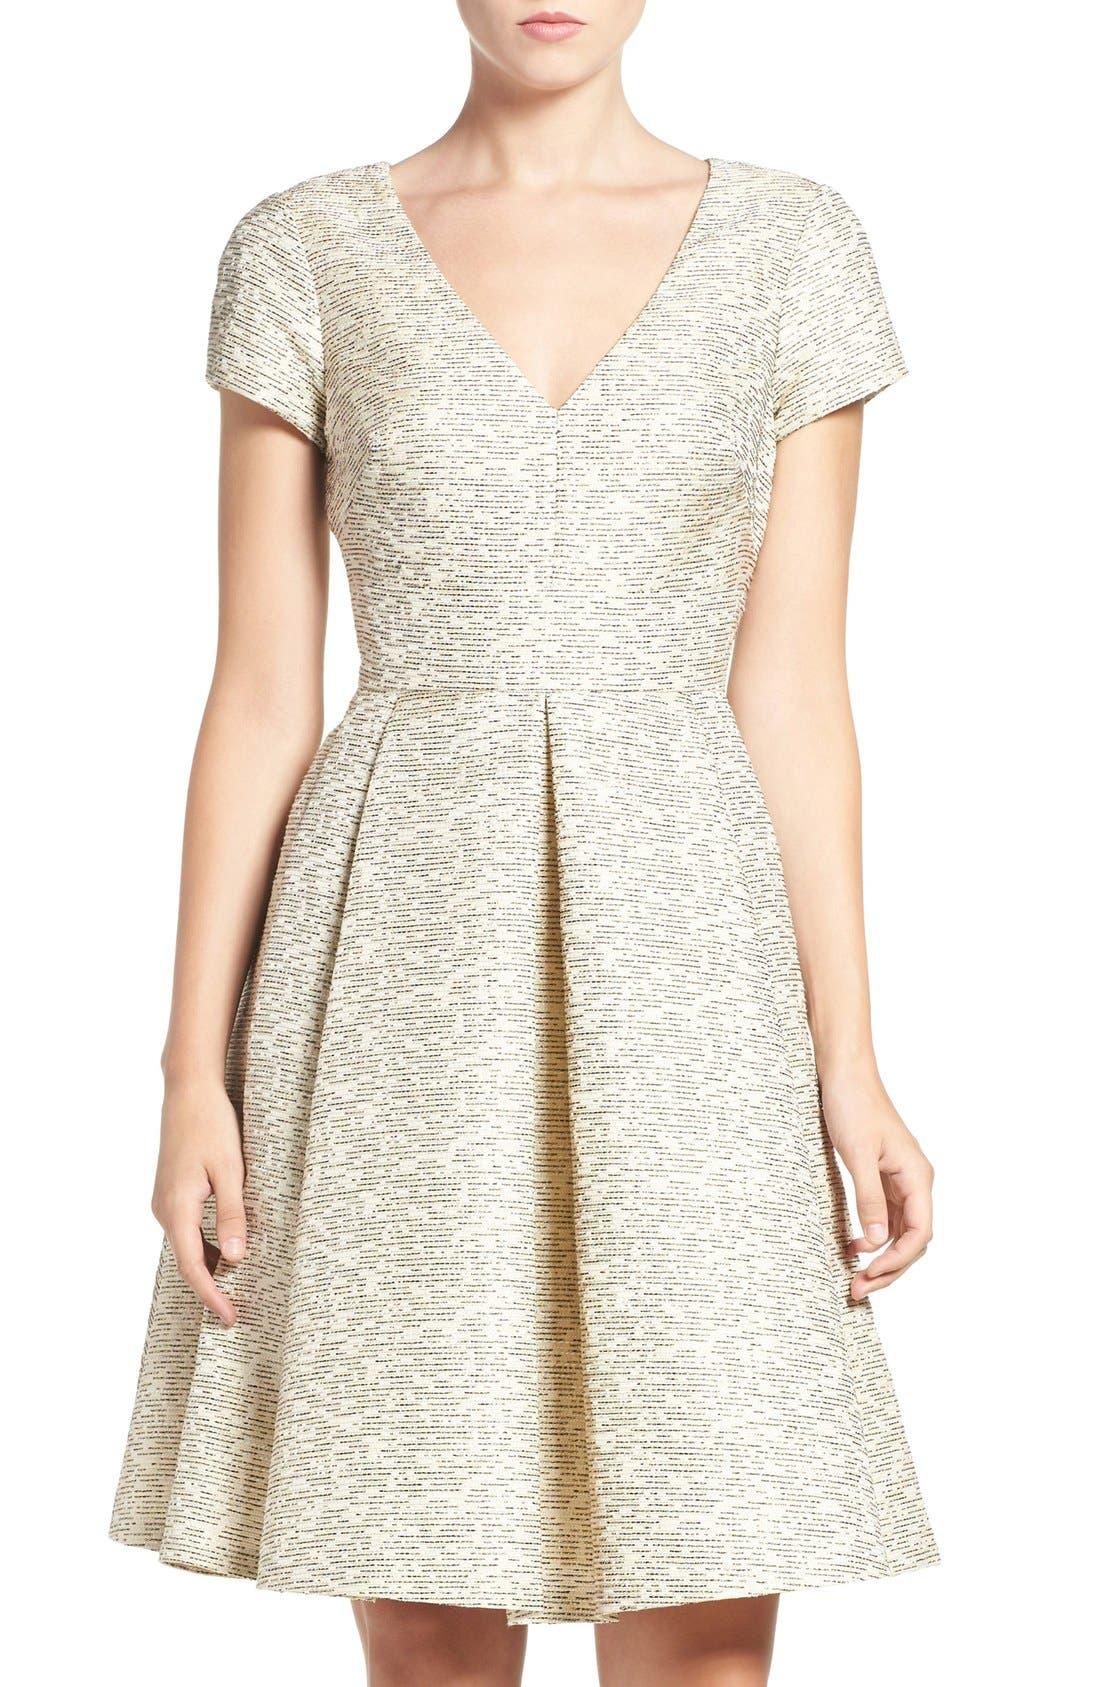 Alternate Image 1 Selected - Eliza J Metallic Jacquard Fit & Flare Dress